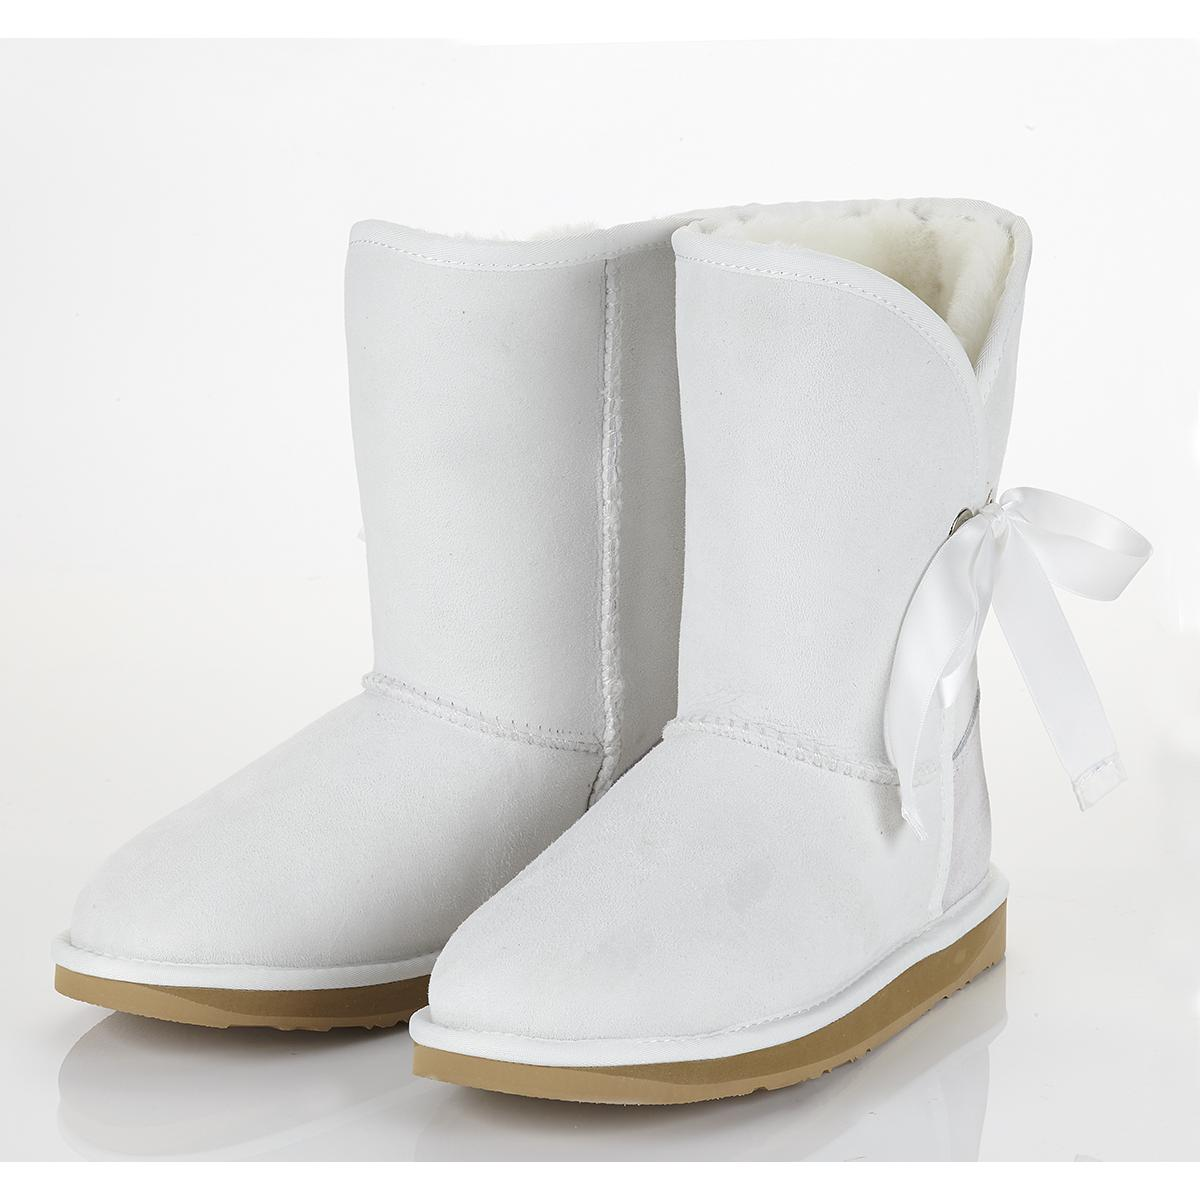 Luxe Sheepskin Boots